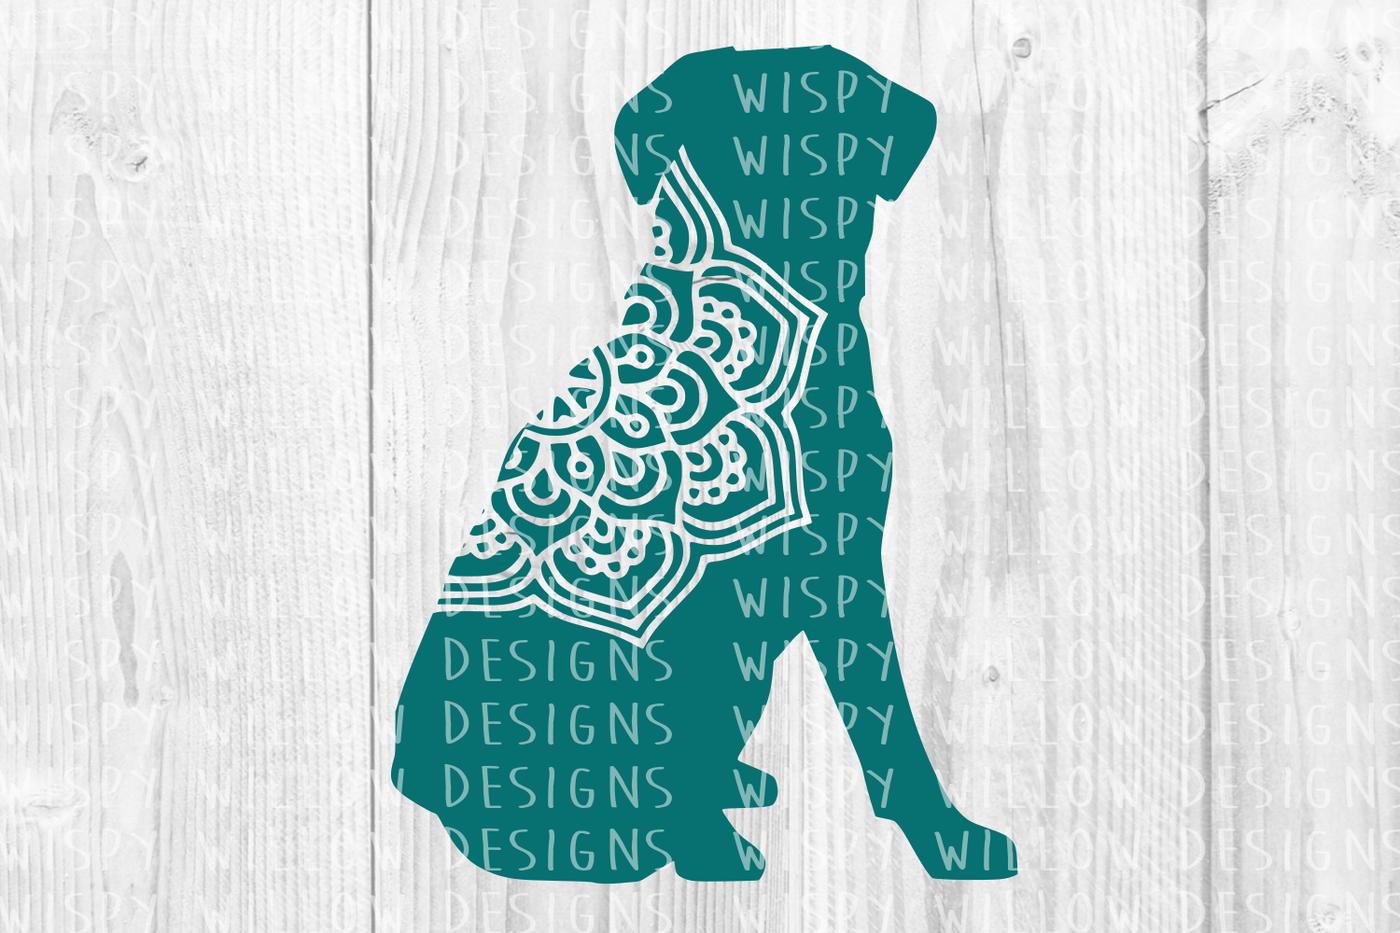 Dog Mandala Svg Dxf Eps Png Jpg Pdf By Wispy Willow Designs